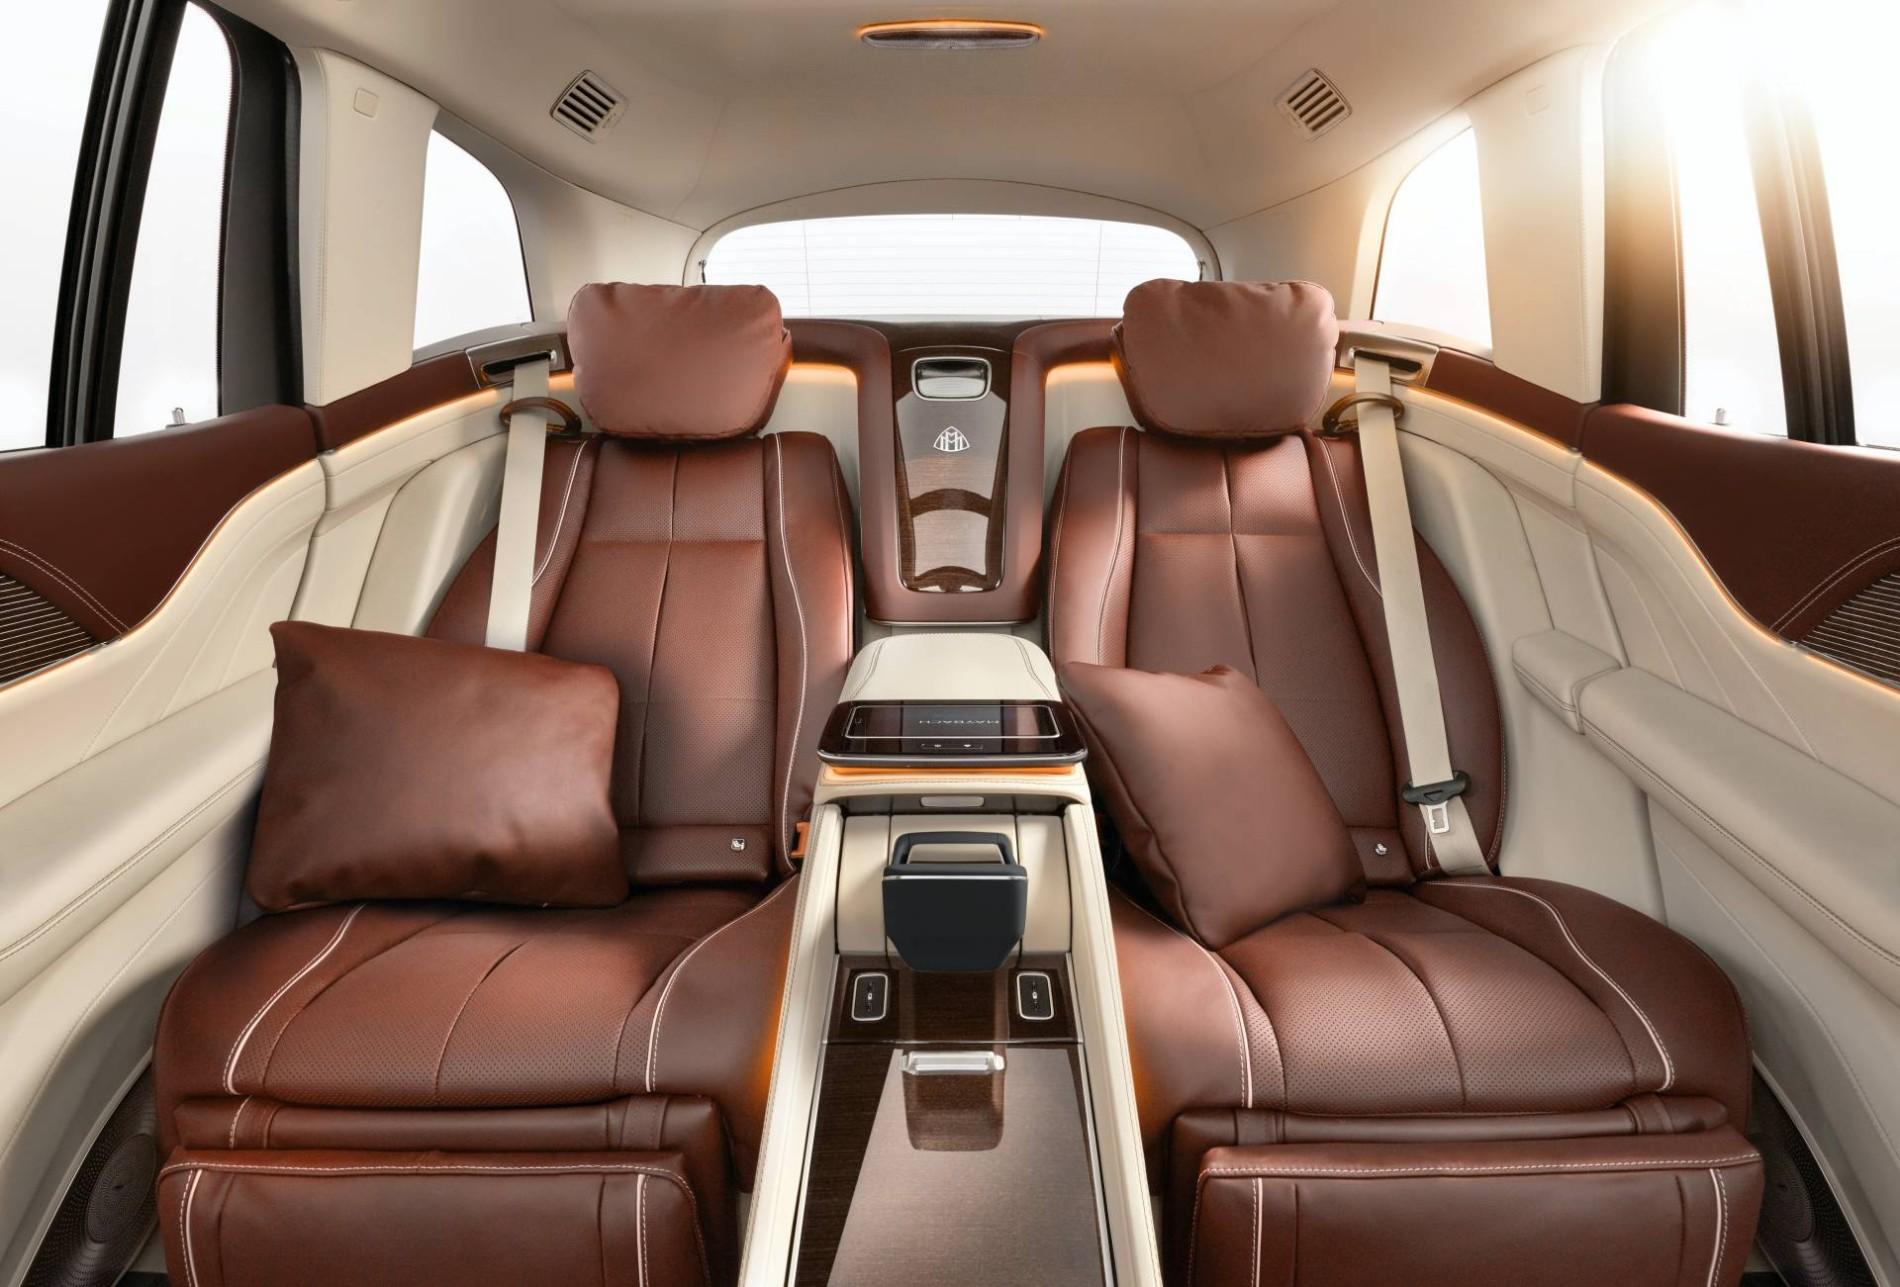 Mercedes-Maybach GLS 600 - Mercedes-Maybach GLS 600